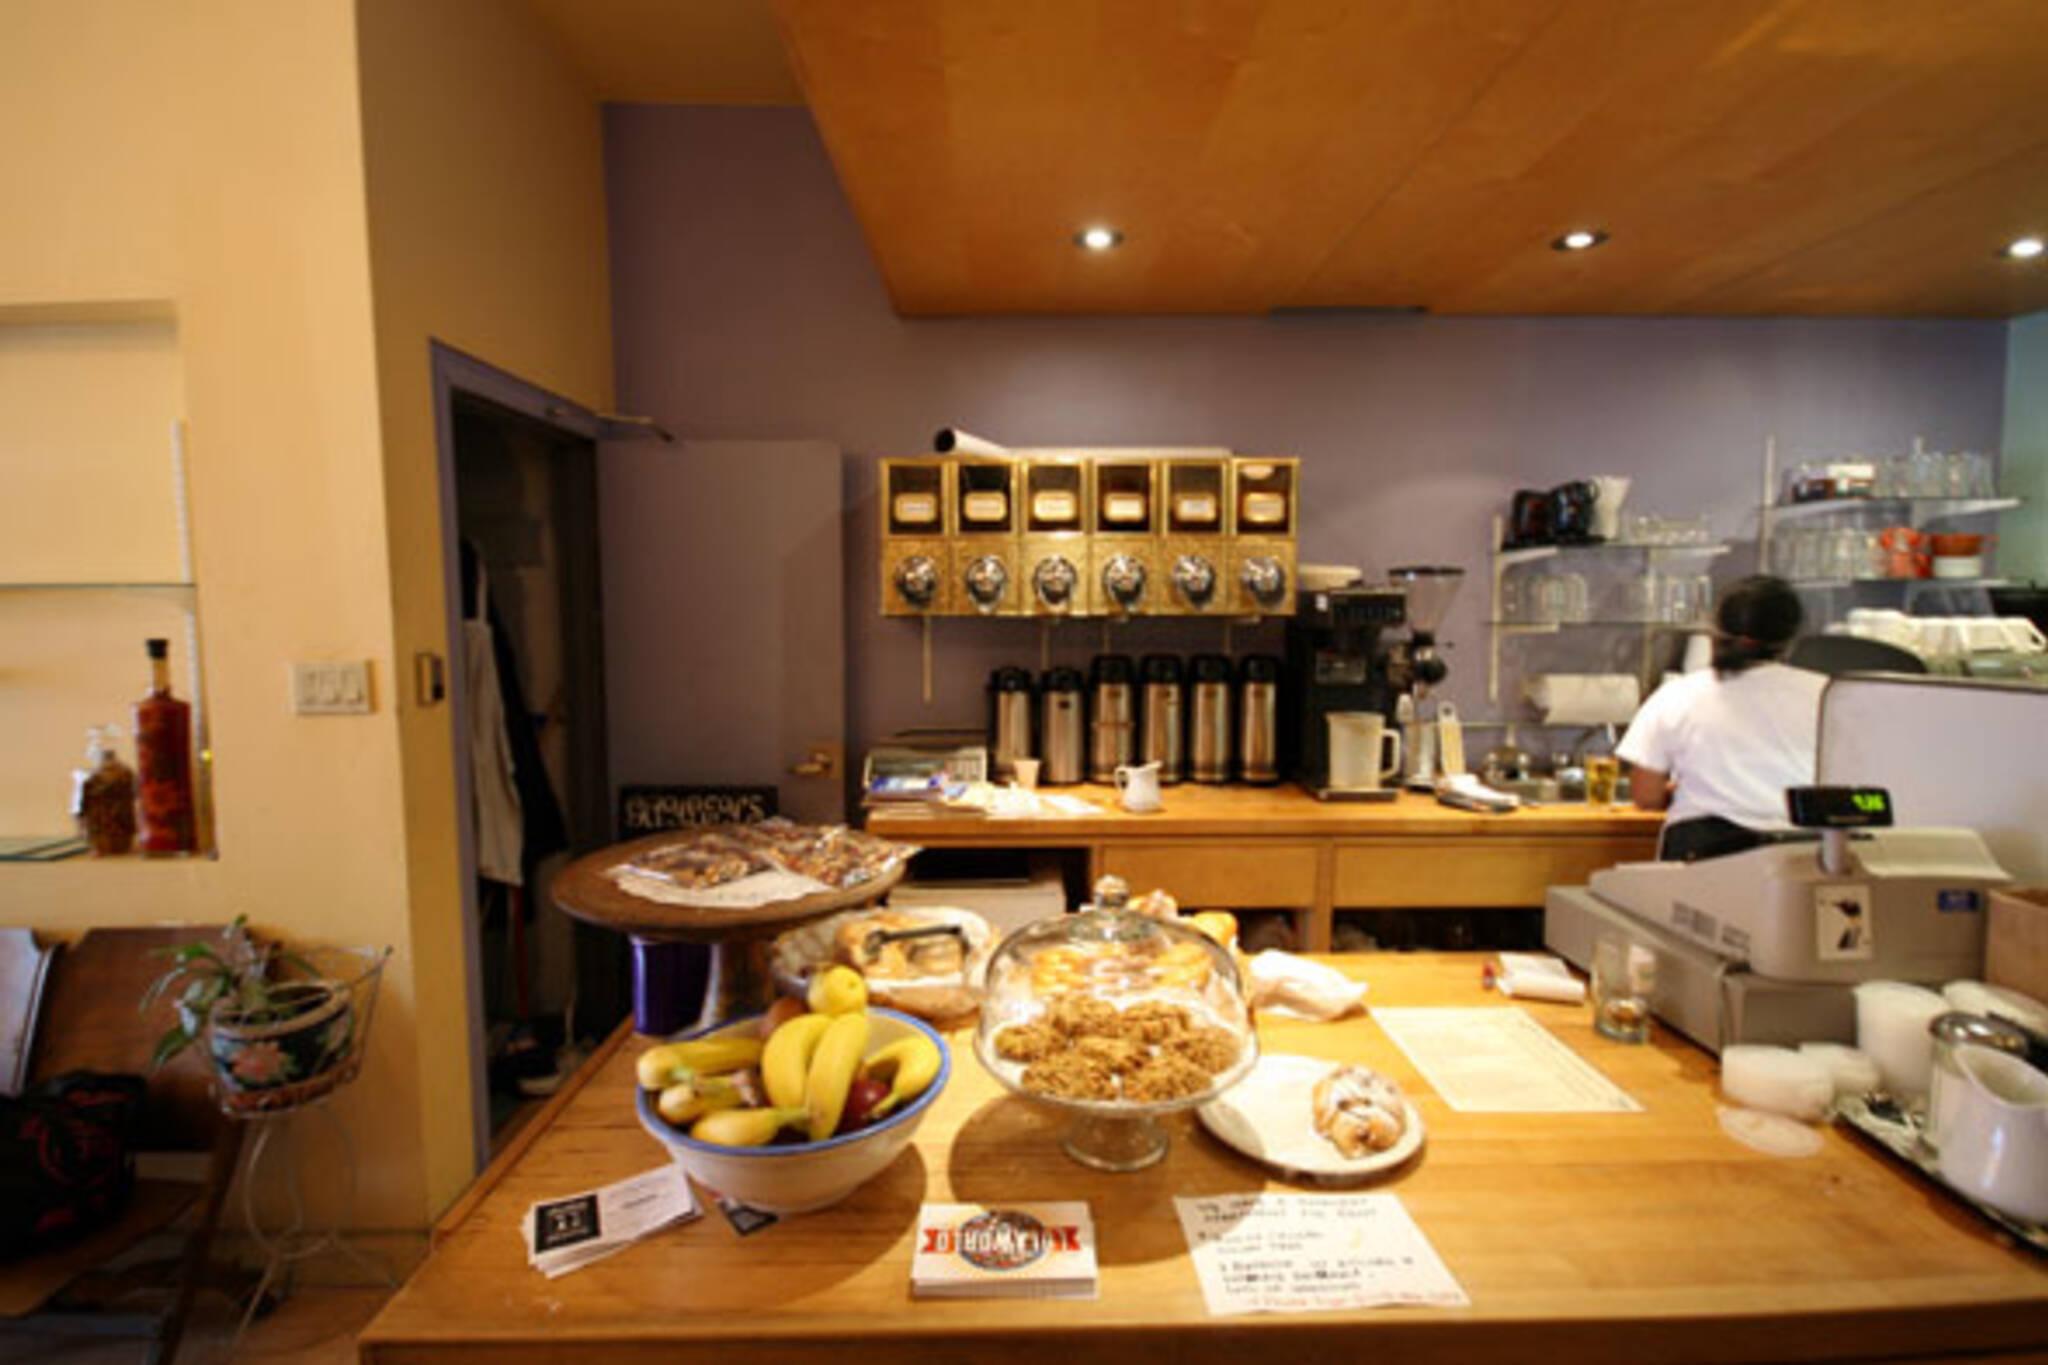 Gayley's Cafe